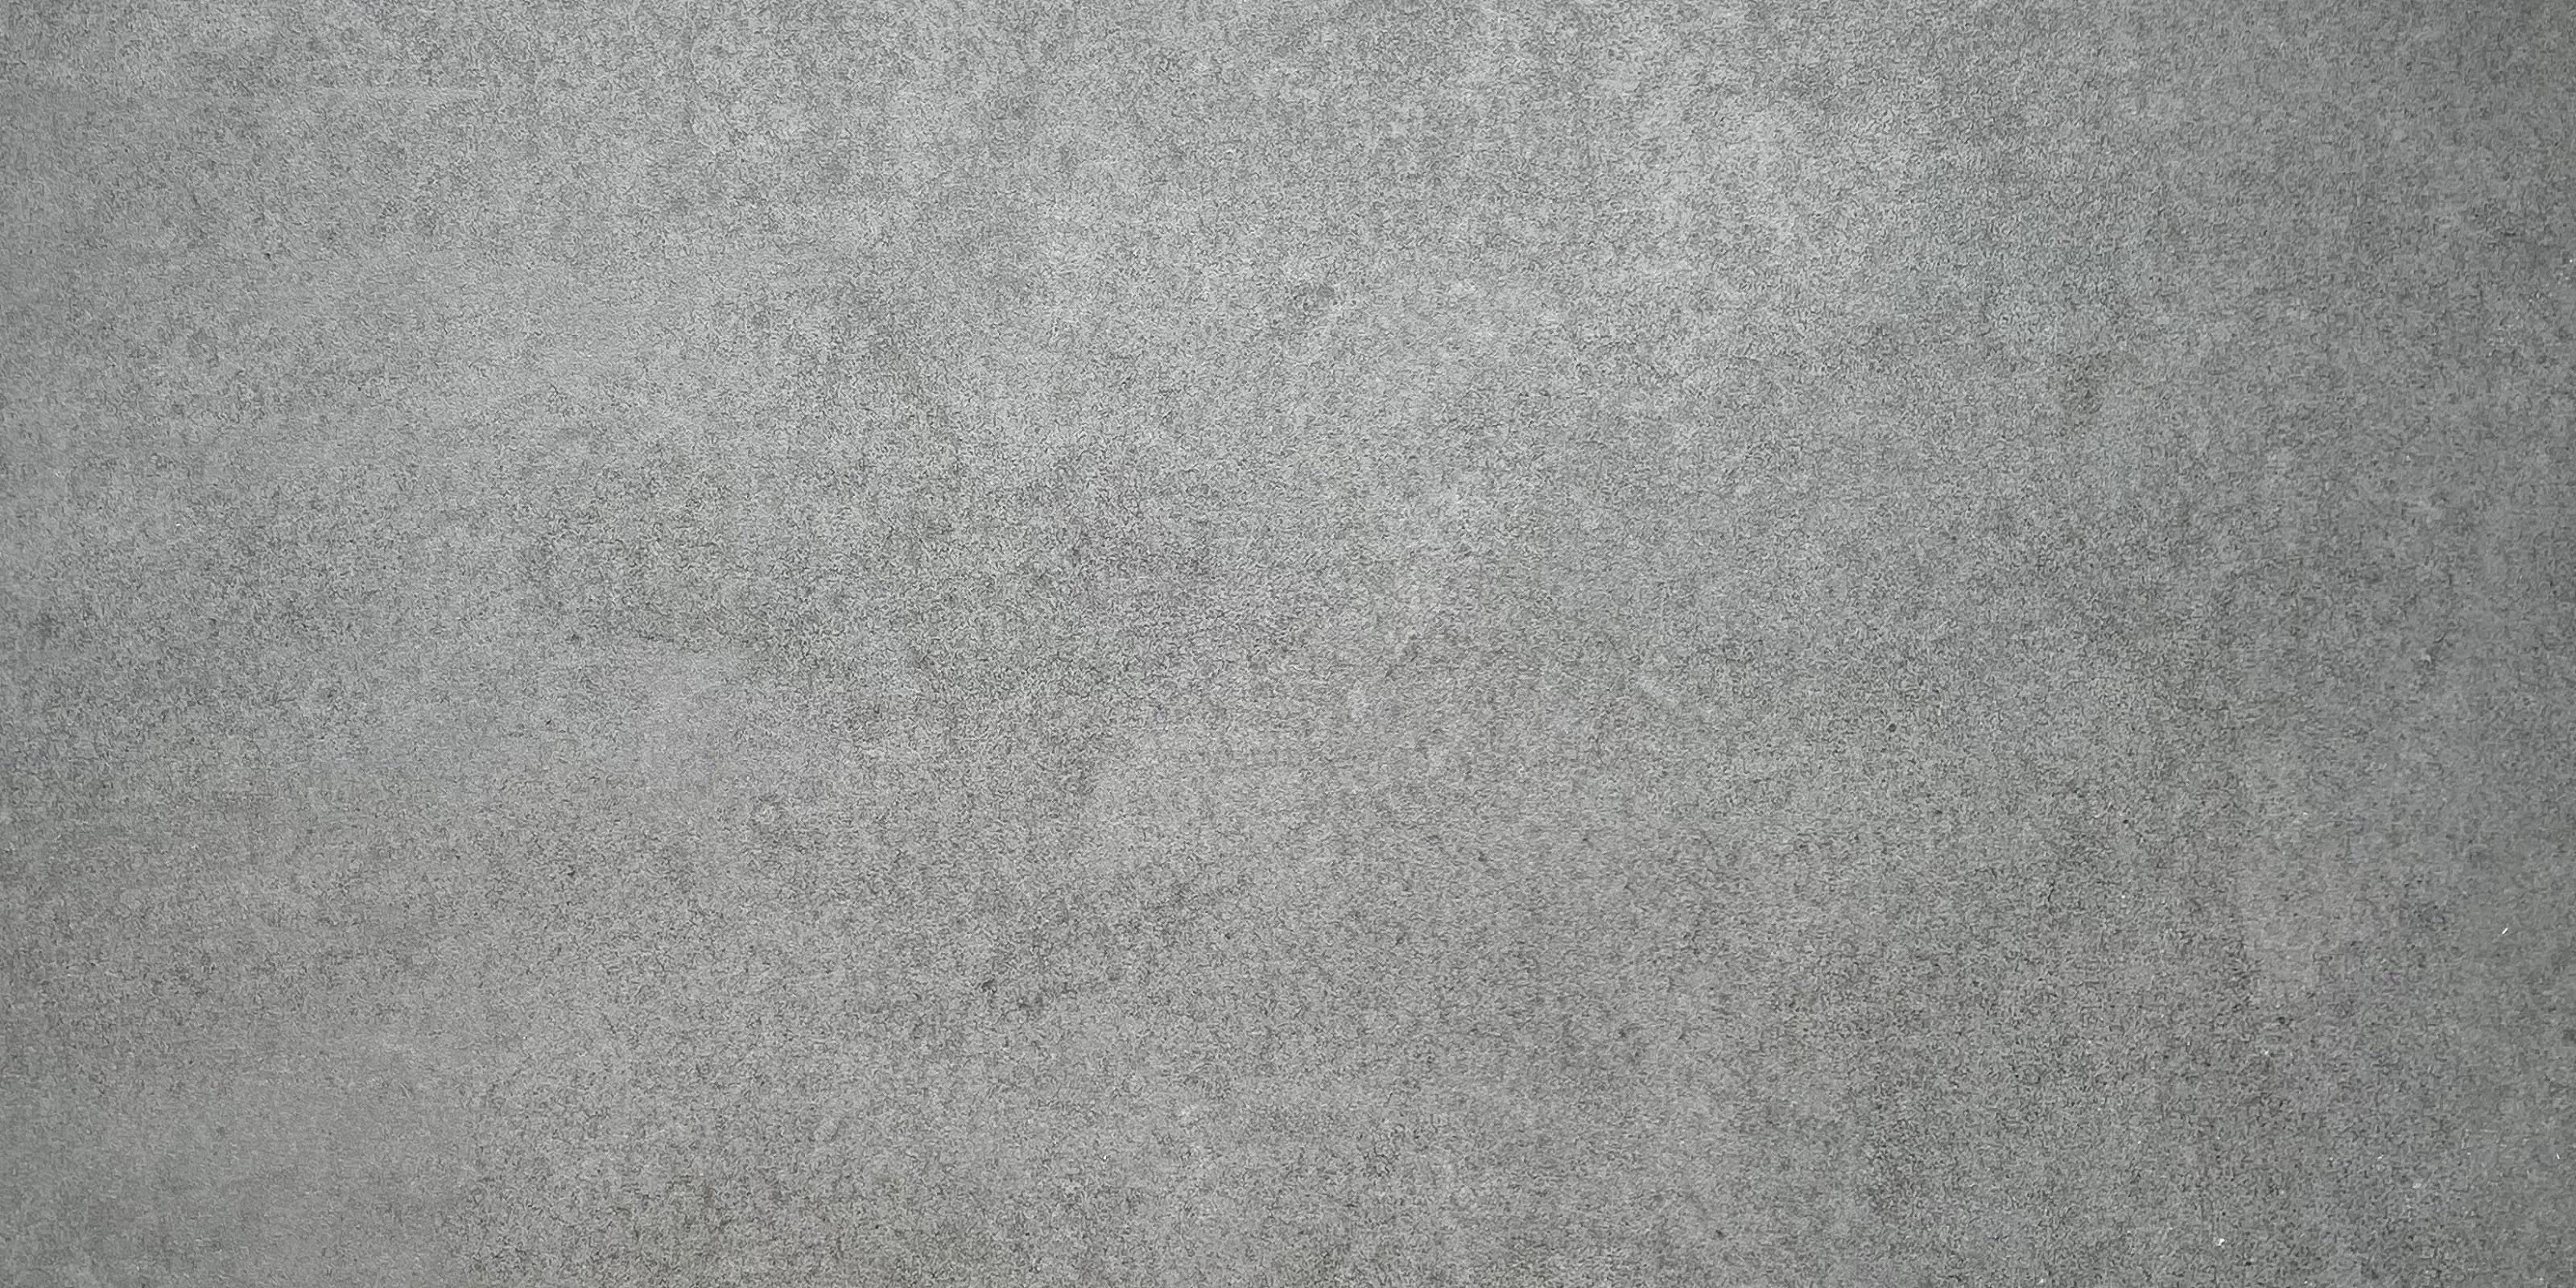 Osmose Coverage dunkelgrau 30x60cm Bodenfliese R10